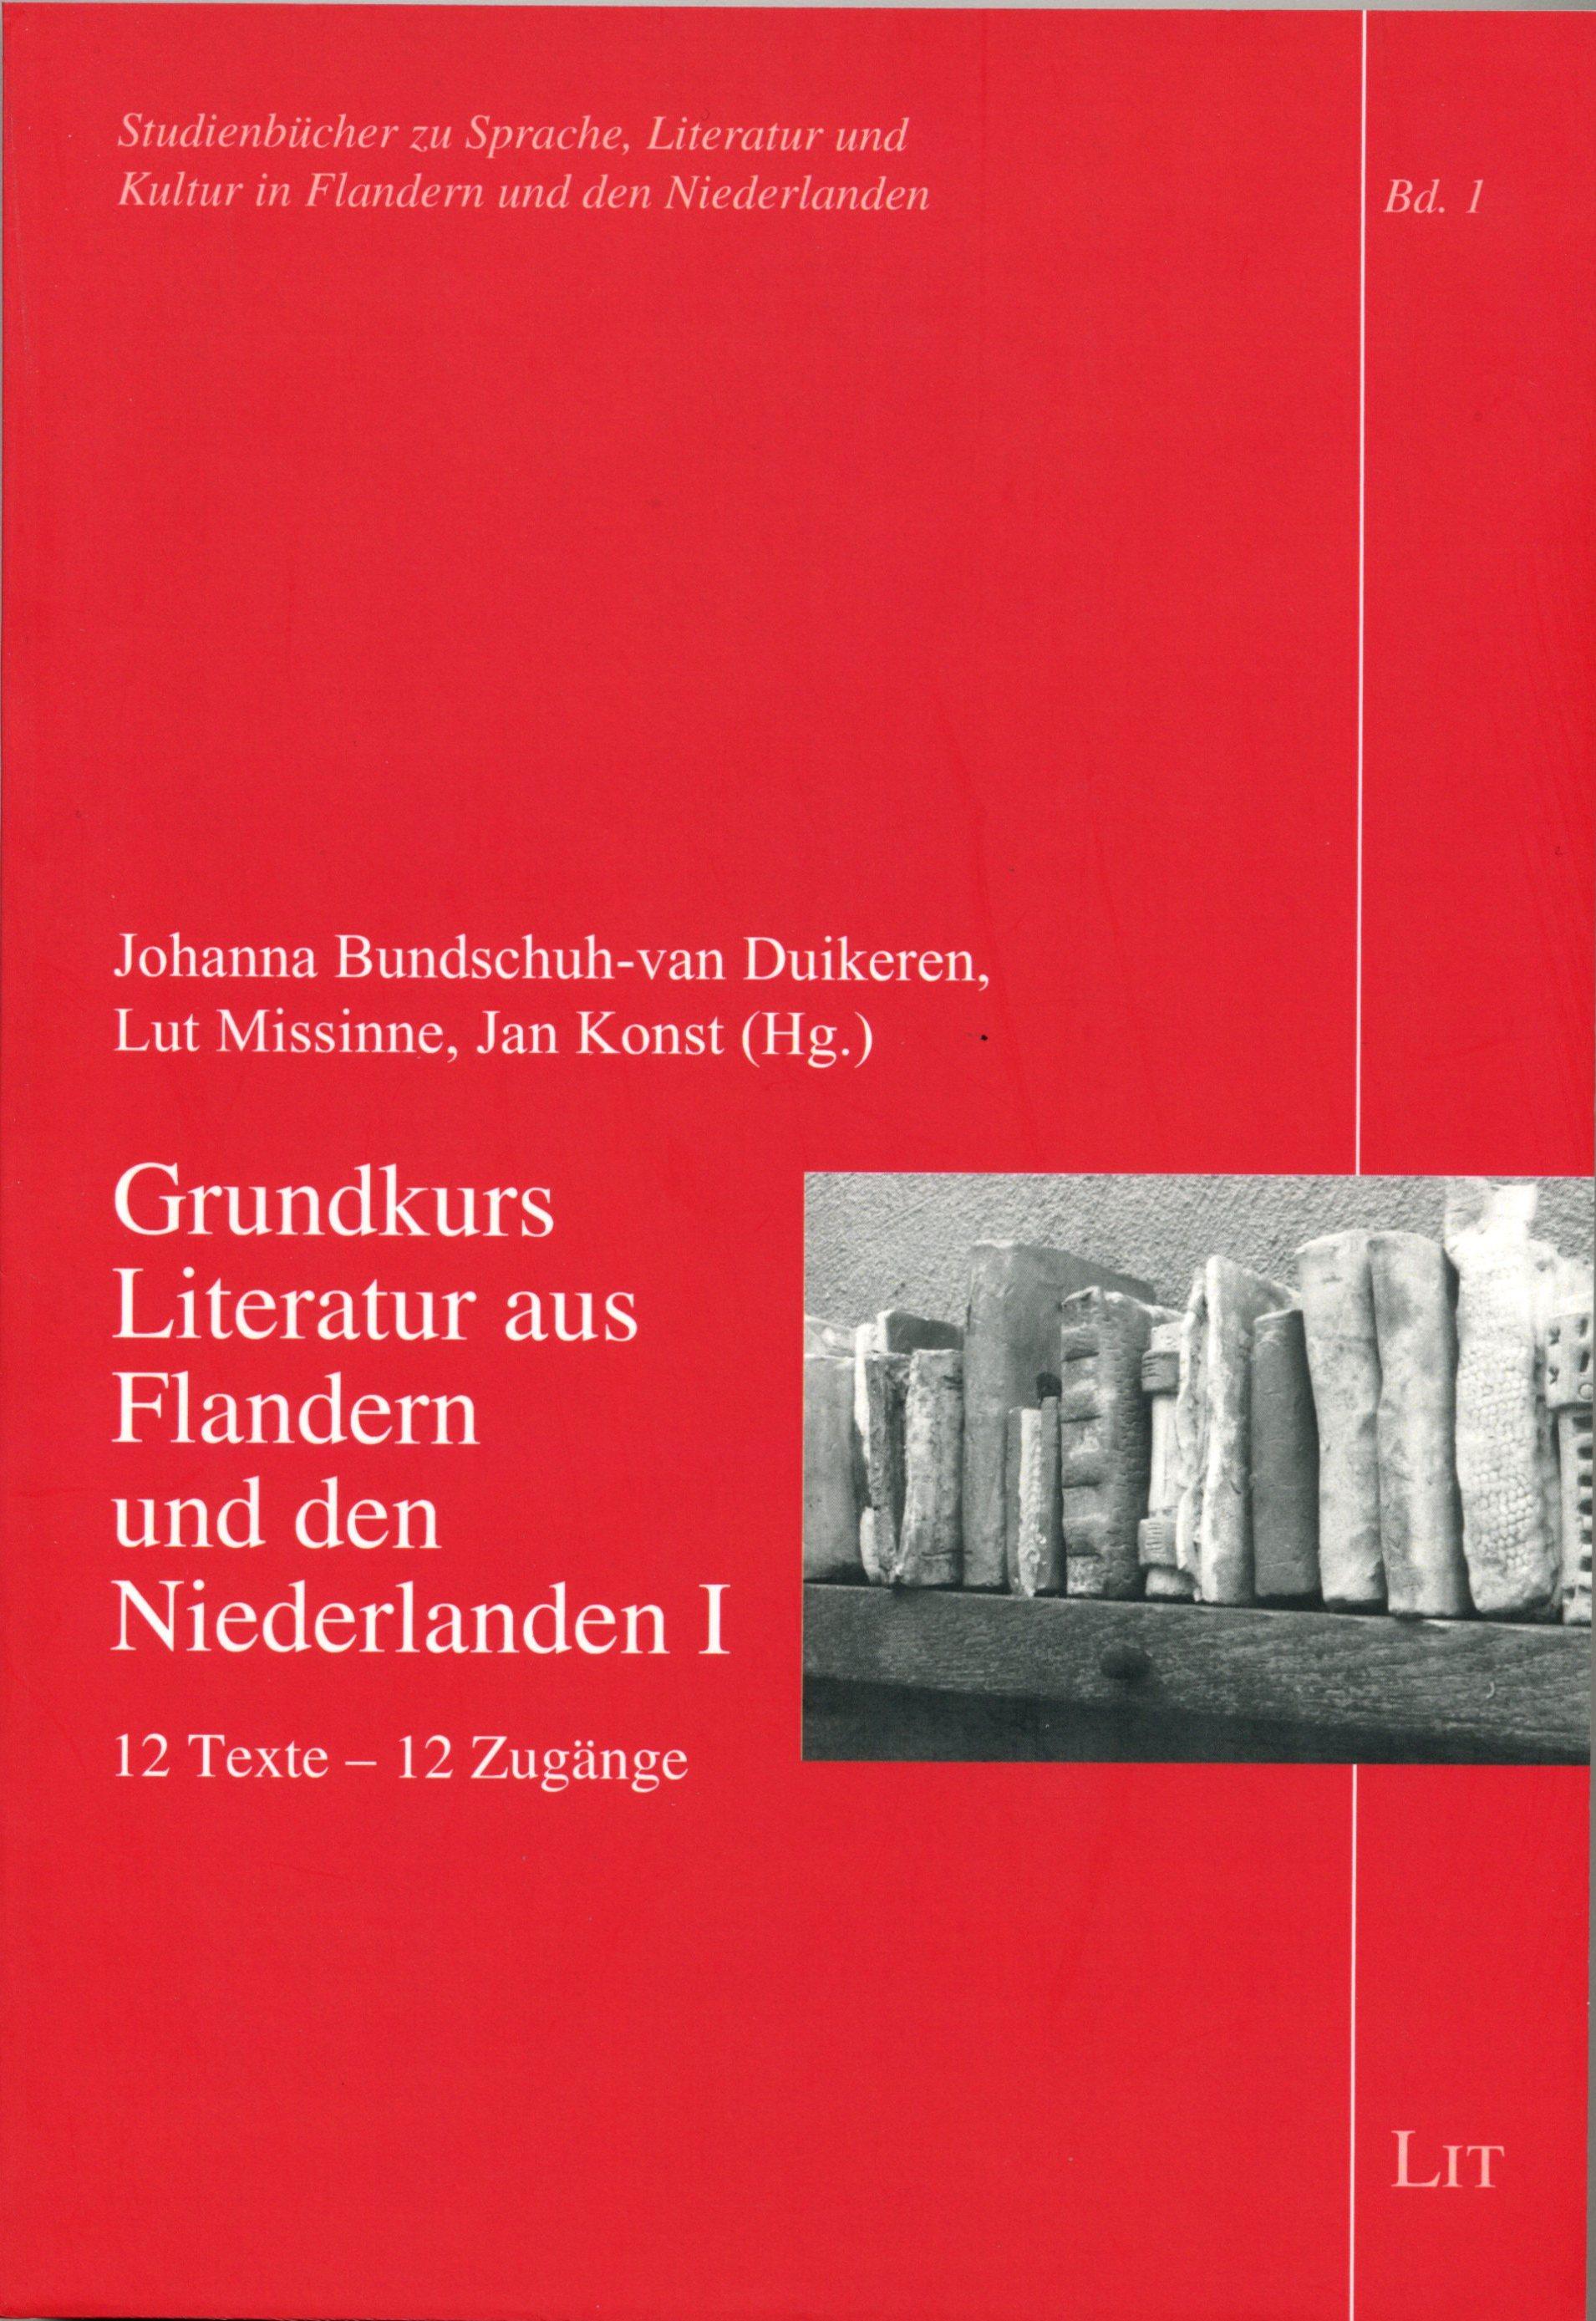 Grundkurs Literatur I